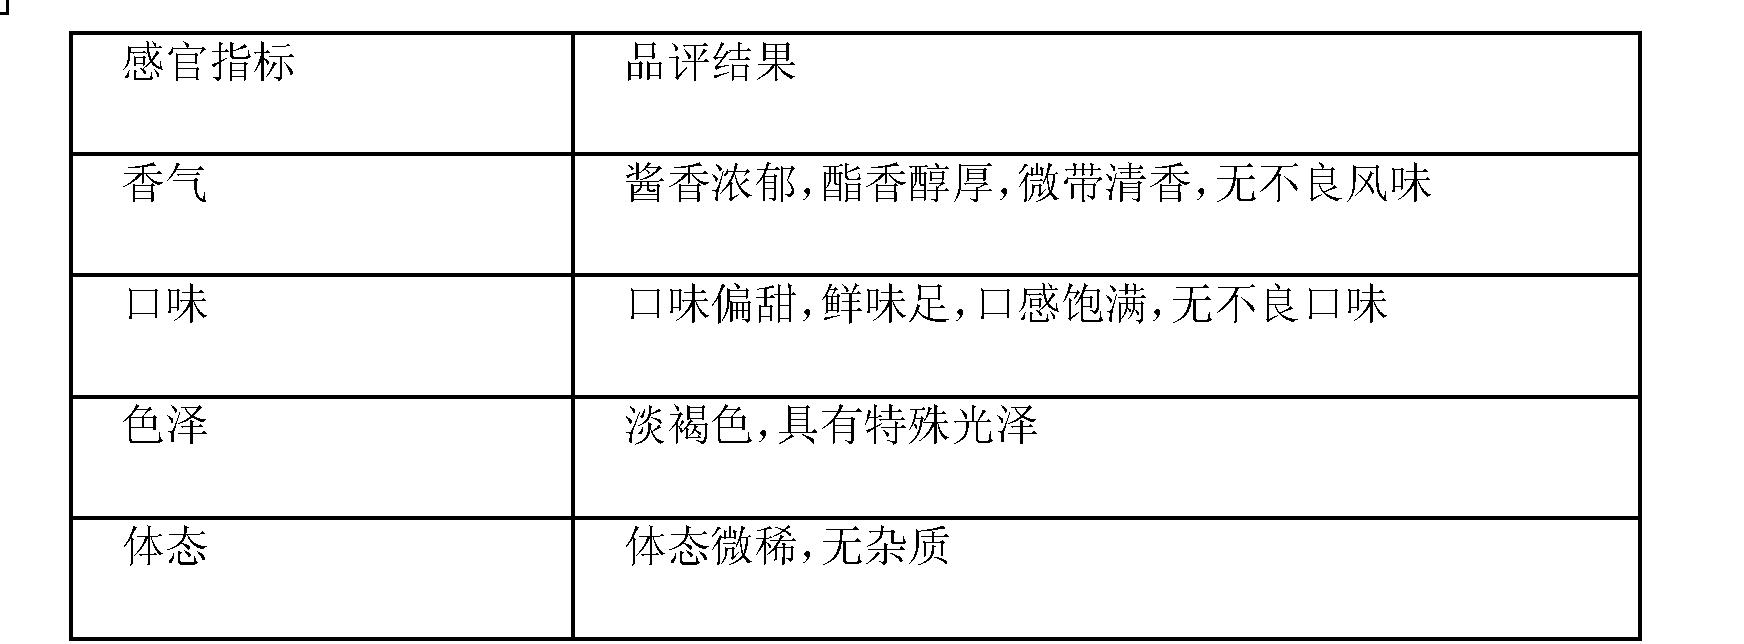 Figure CN102524747AD00102